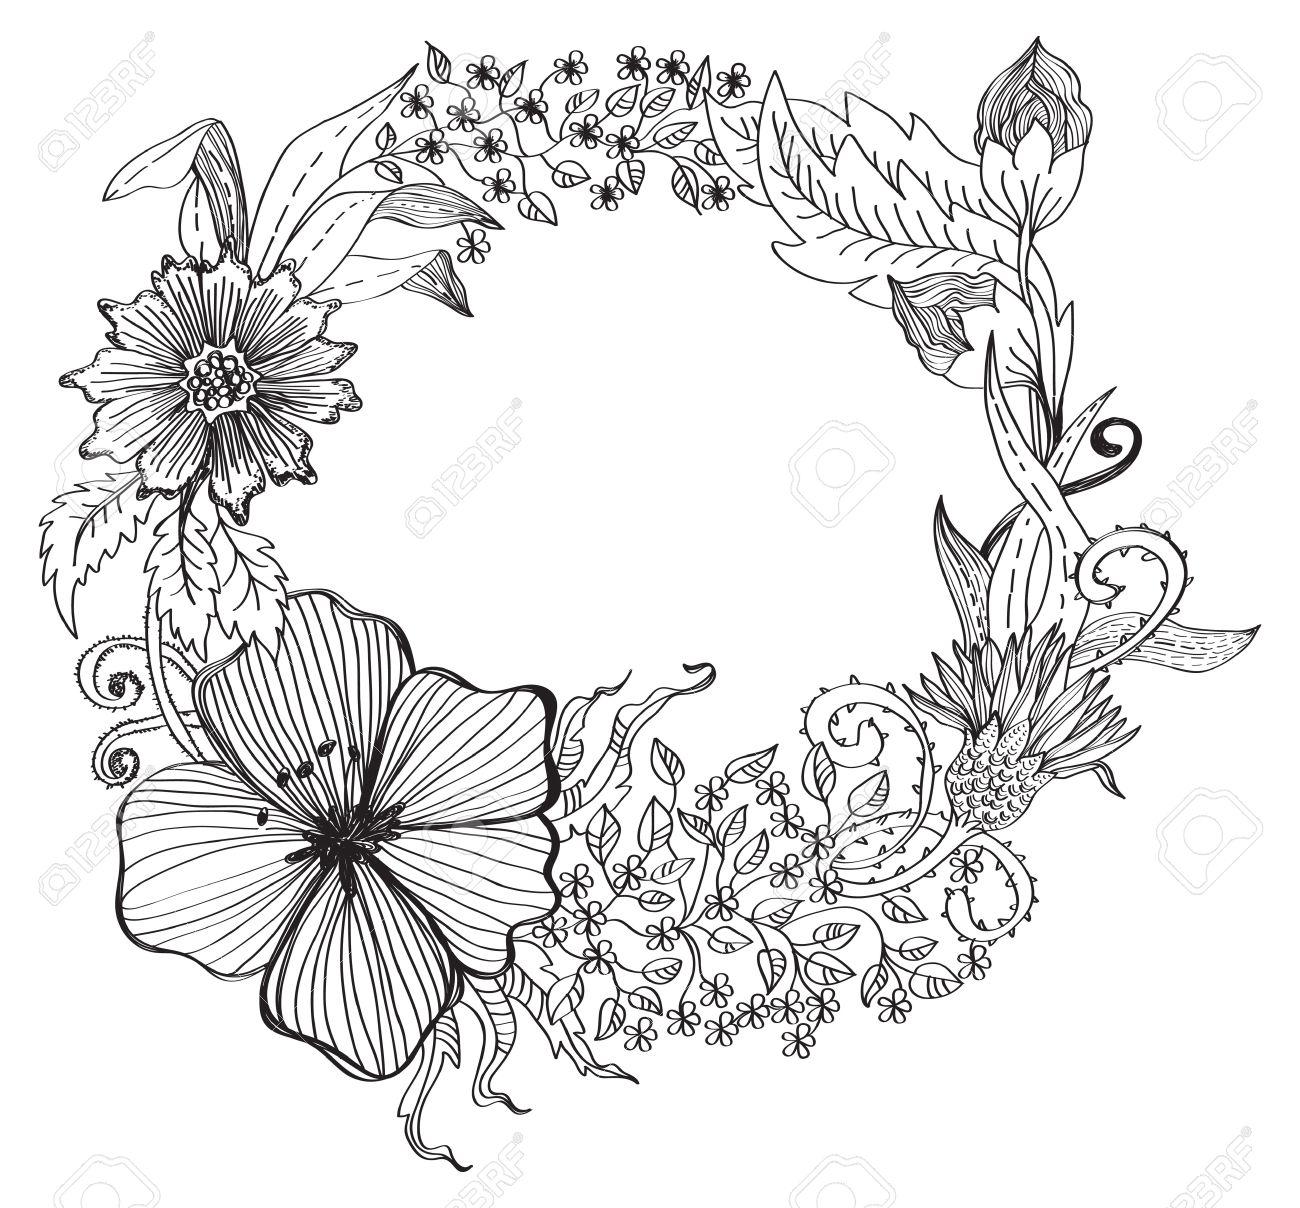 Romantic flower background for design, hand,drawing illustration